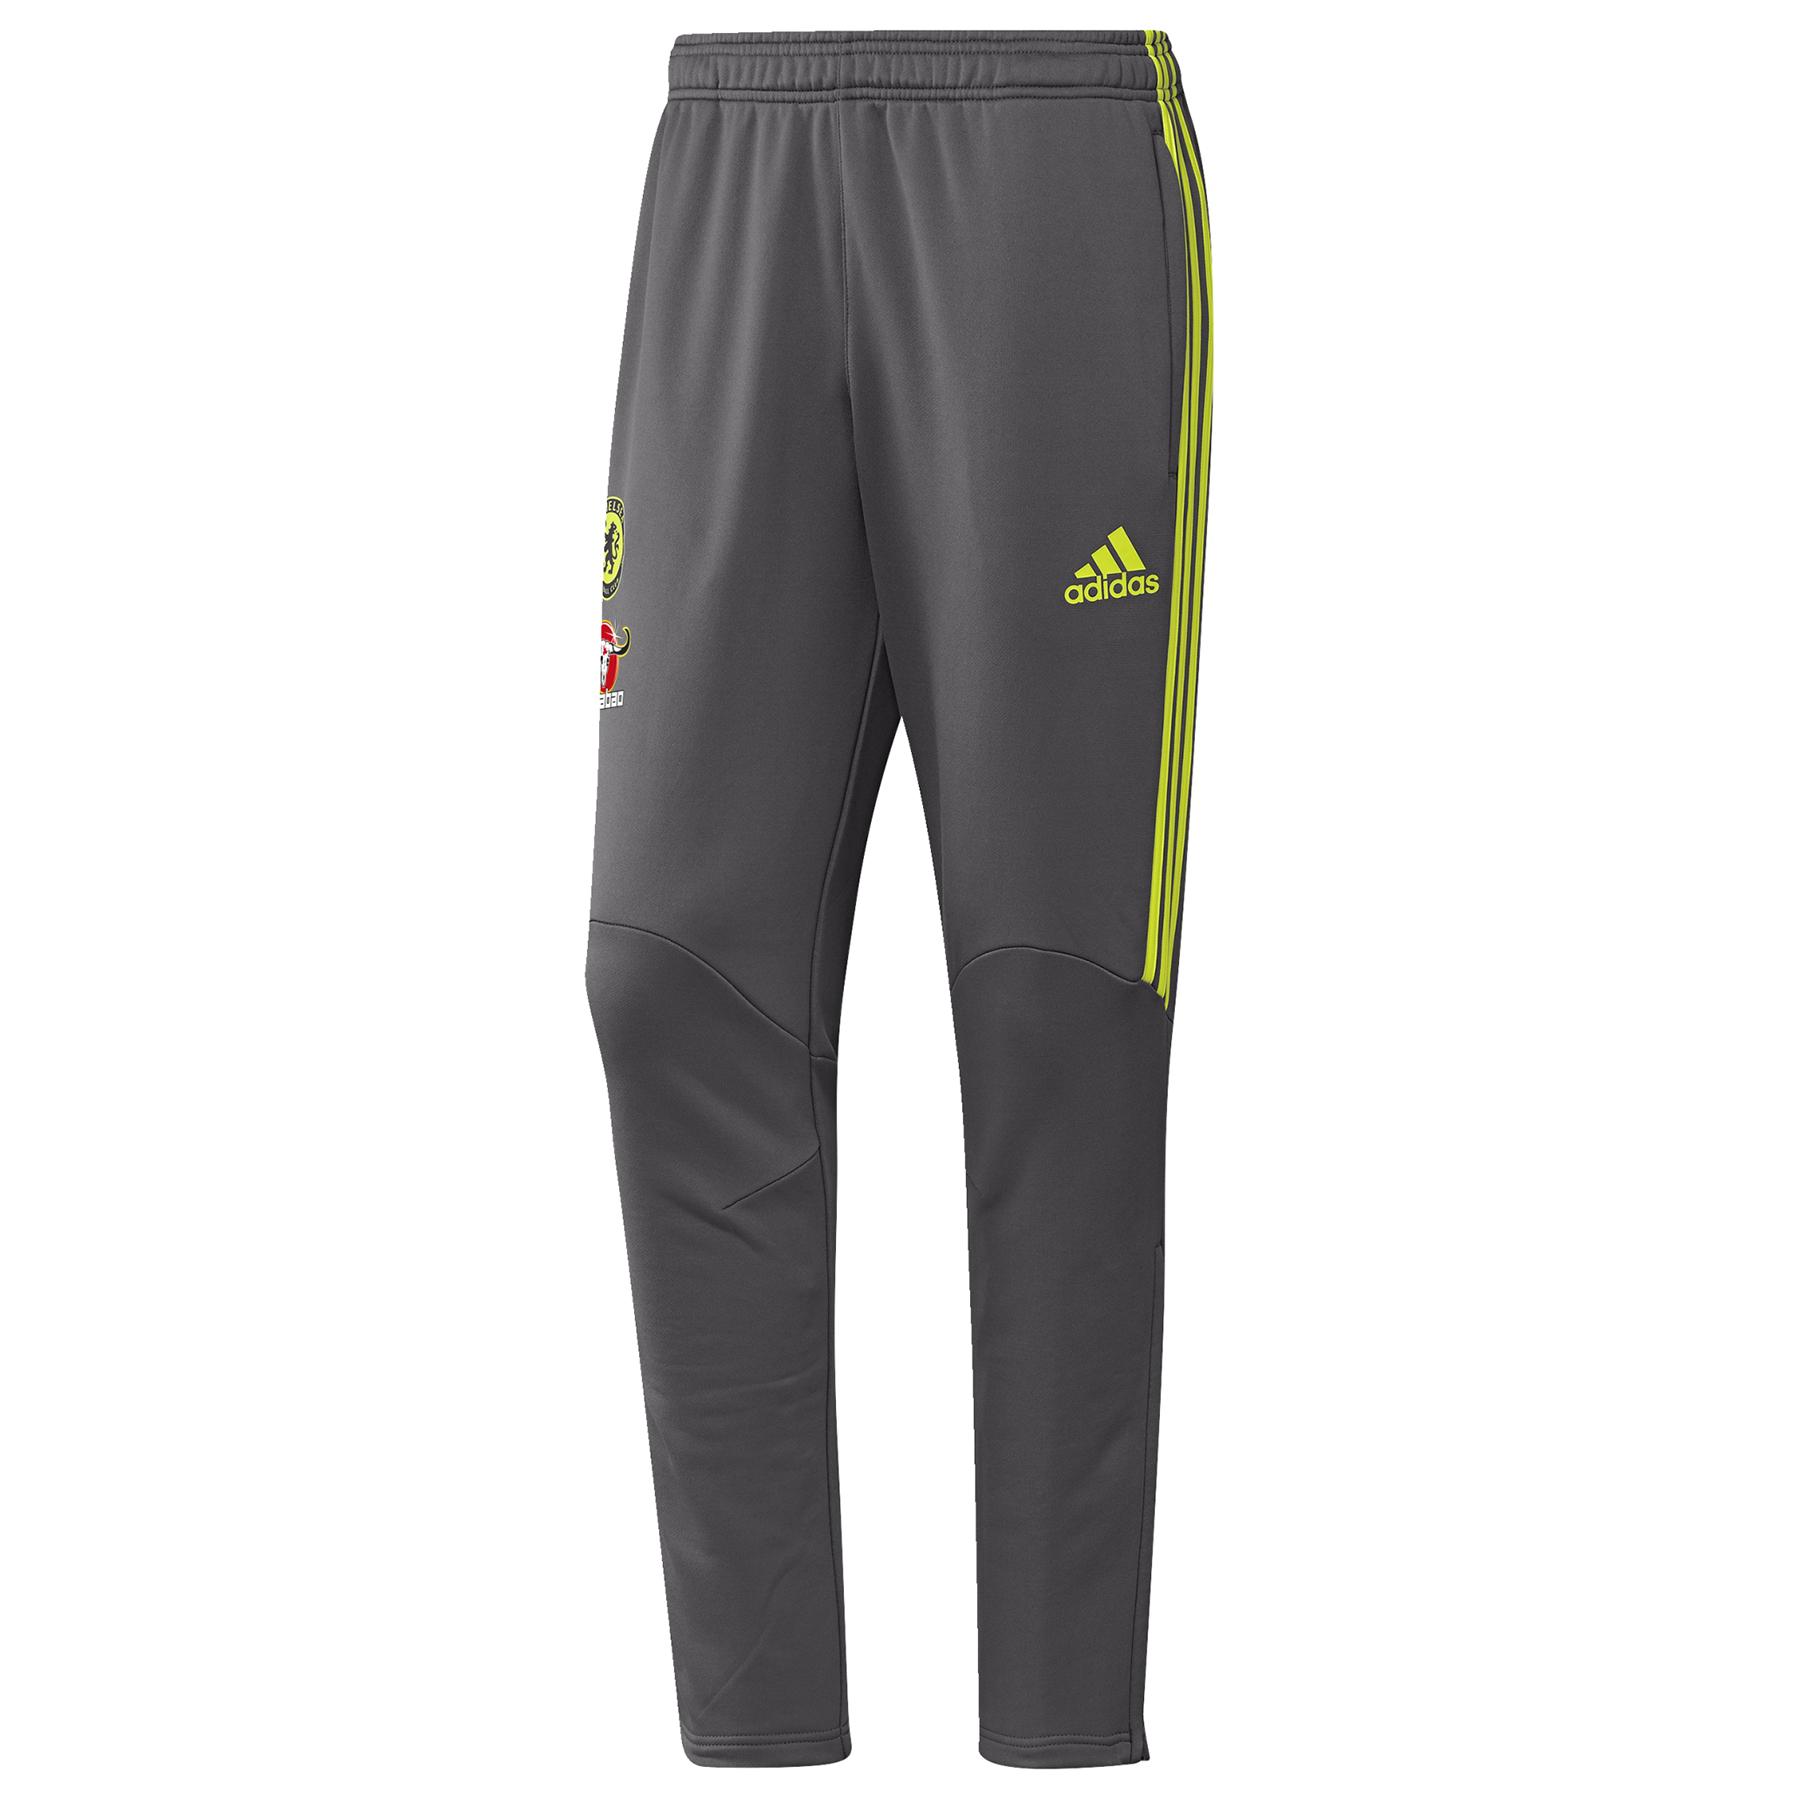 Chelsea Training Presentation Pants - Dark Grey